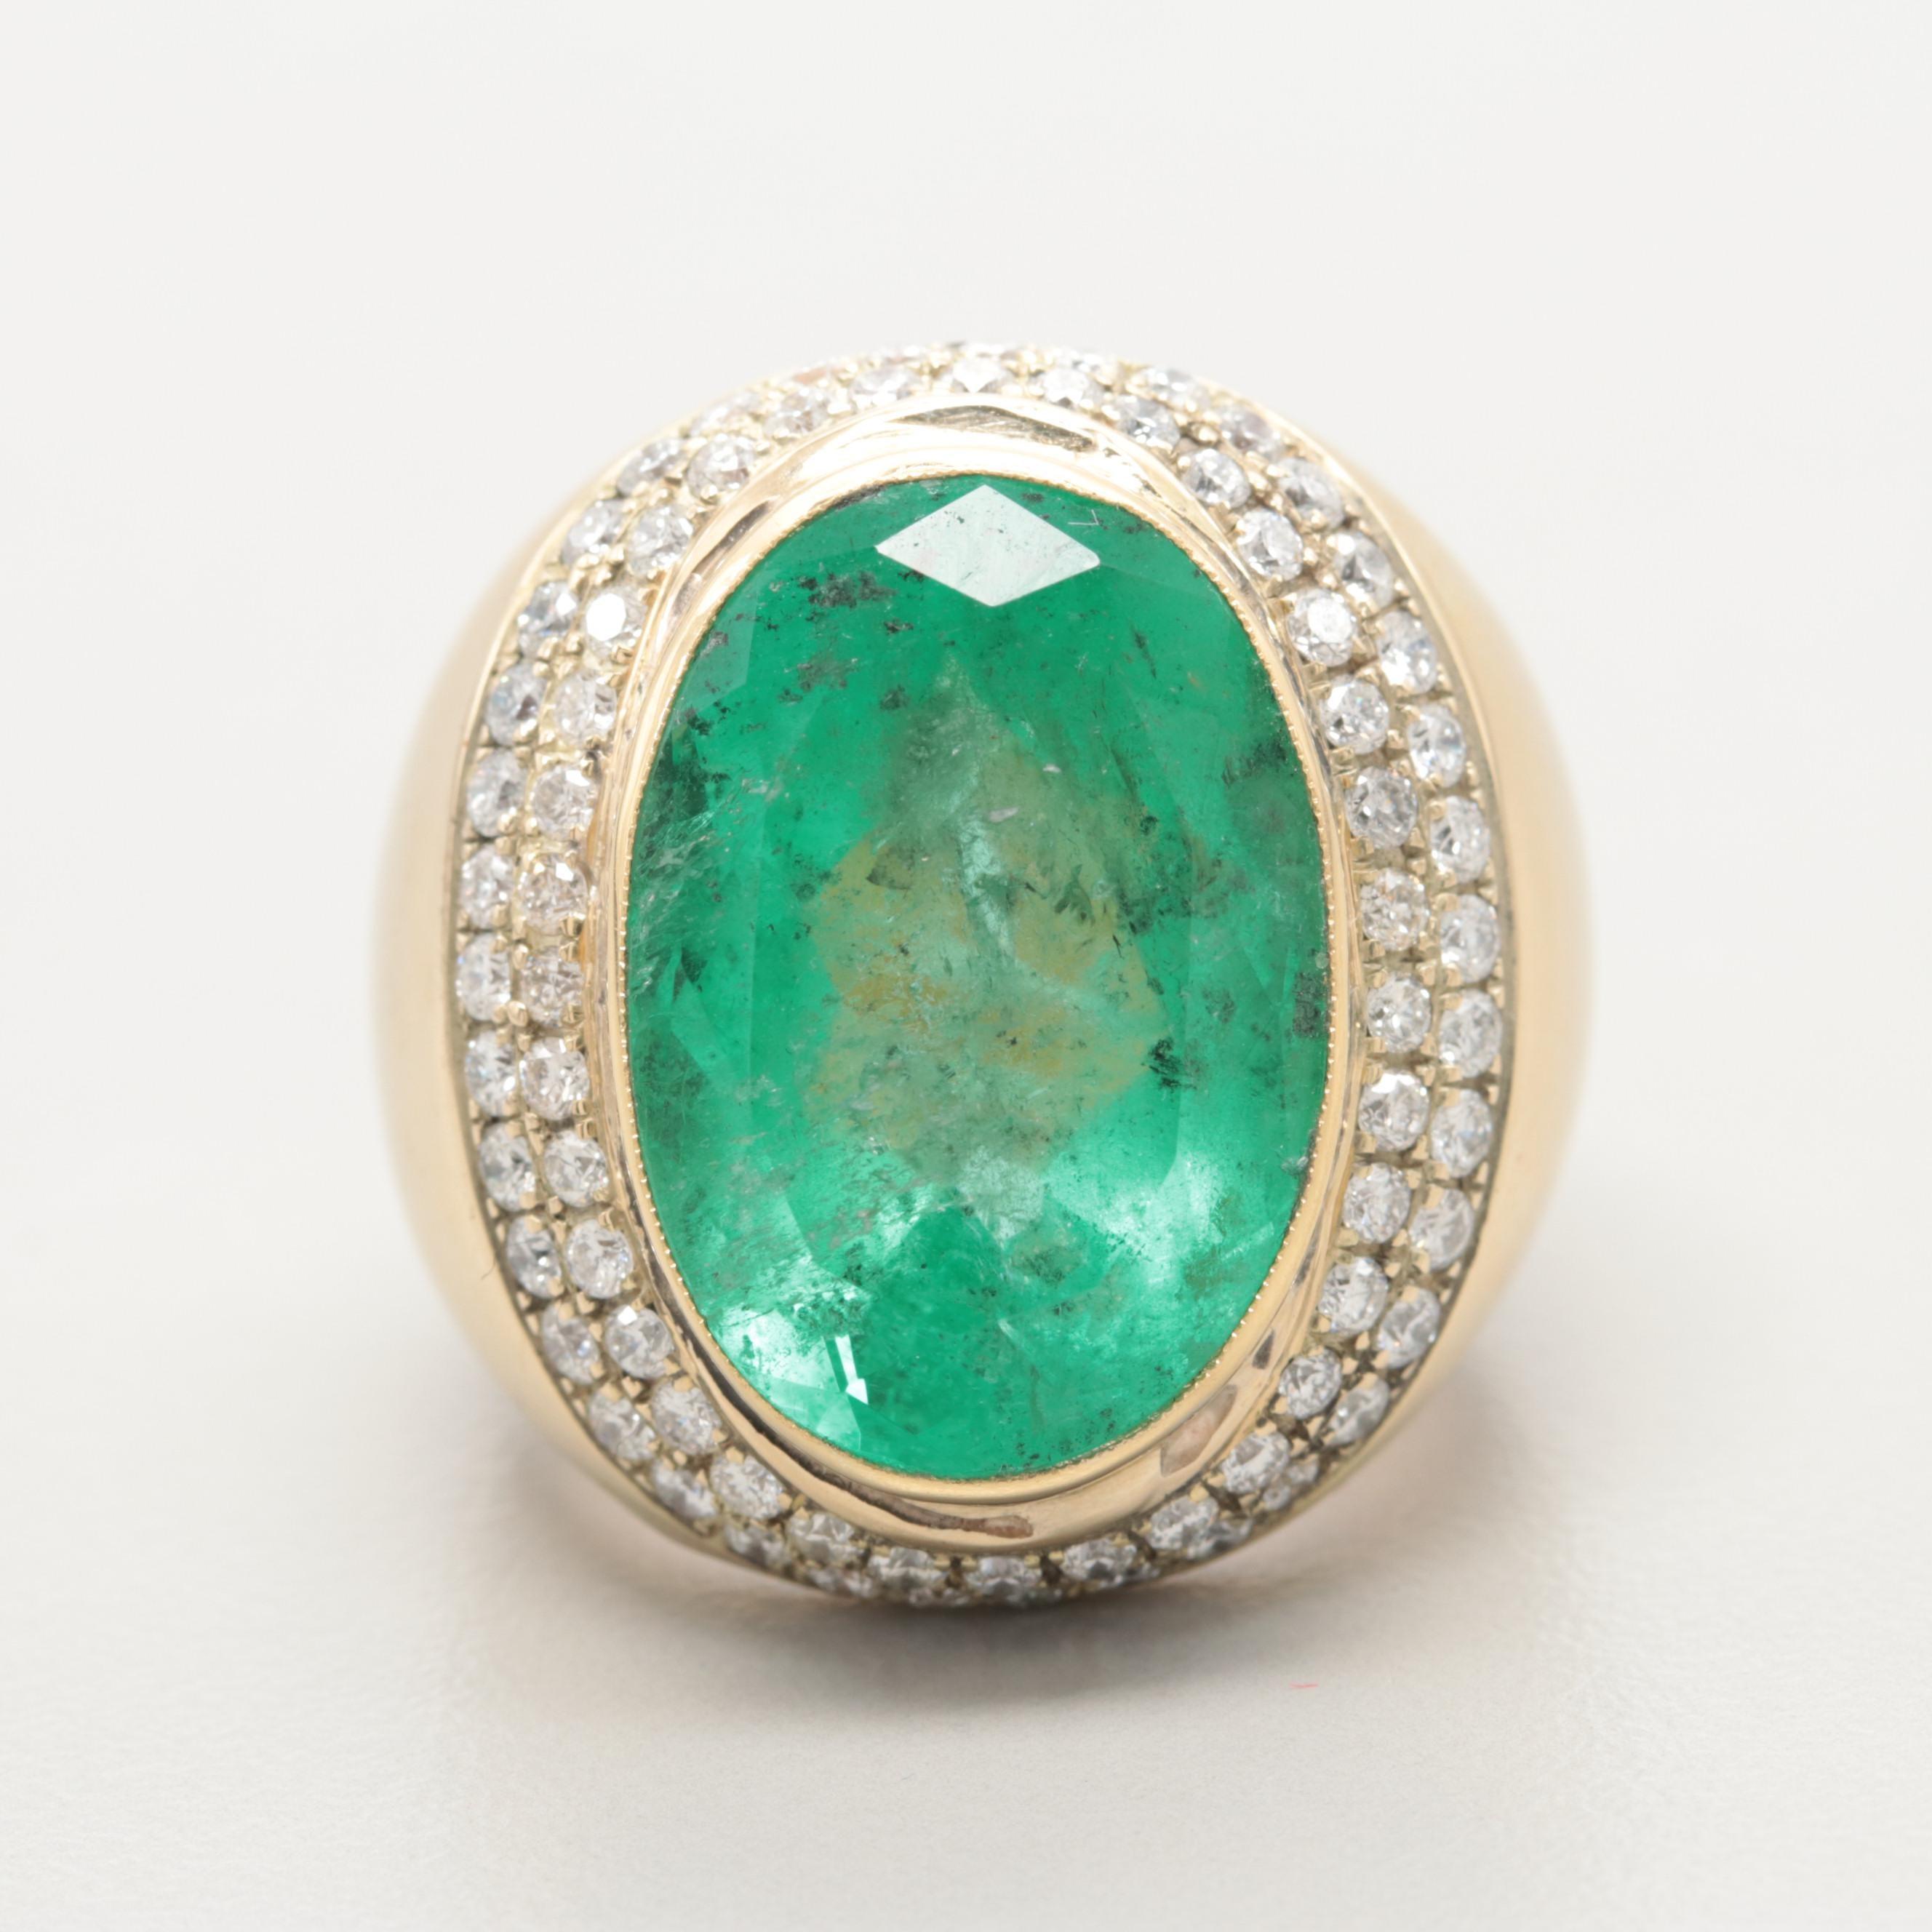 14K Yellow Gold 19.80 CT Emerald and 1.33 CTW Diamond Ring